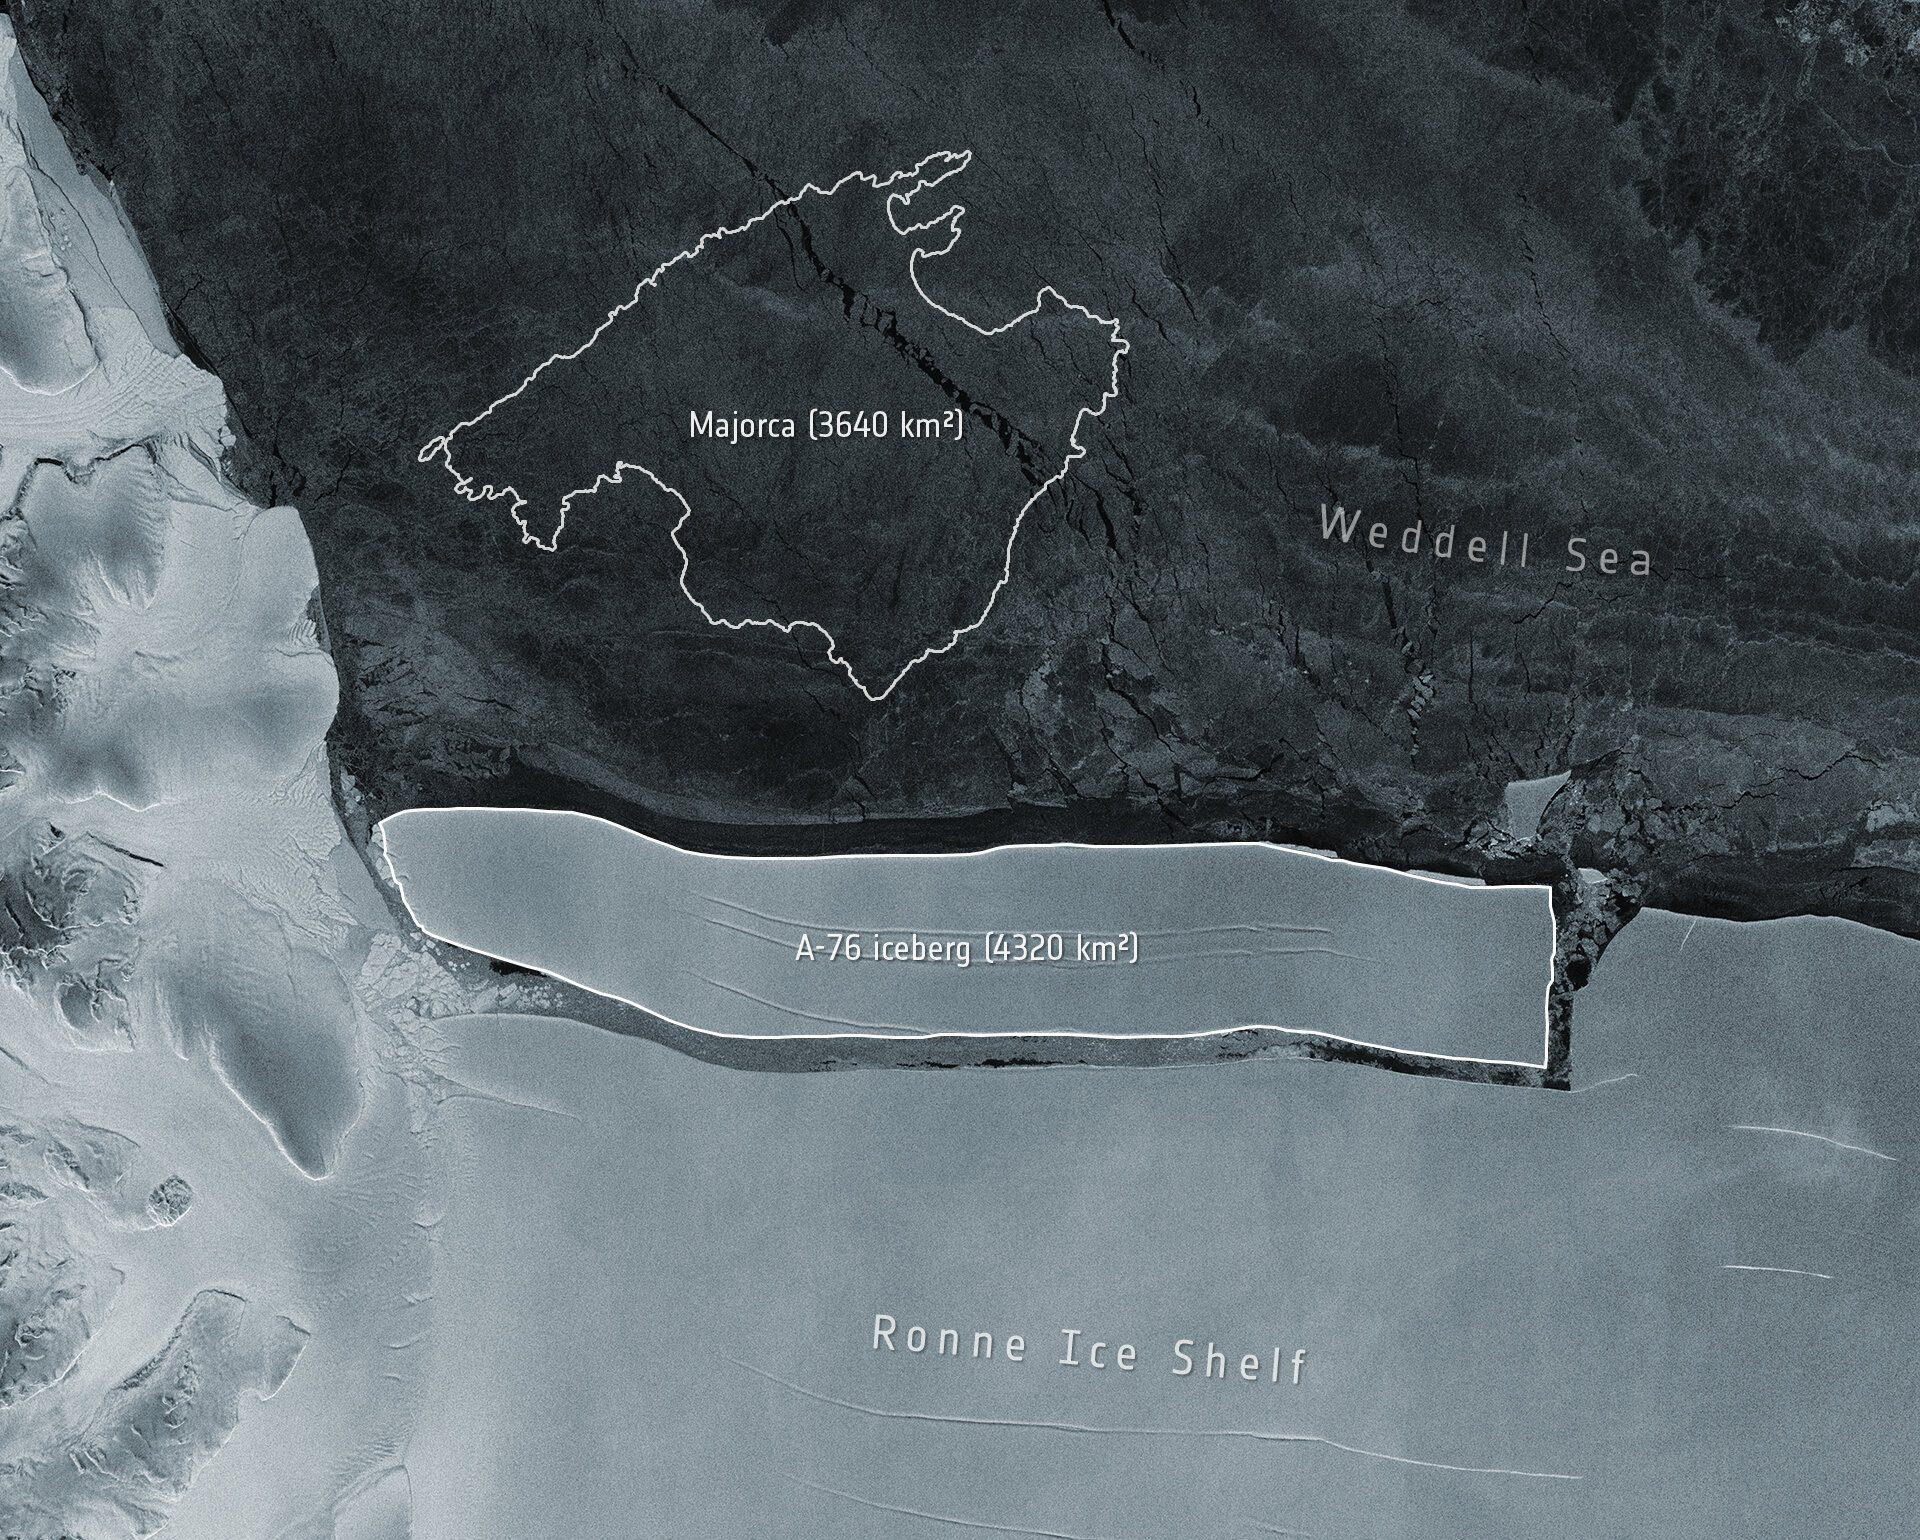 L'iceberg A-76 | Agència Espacial Europea